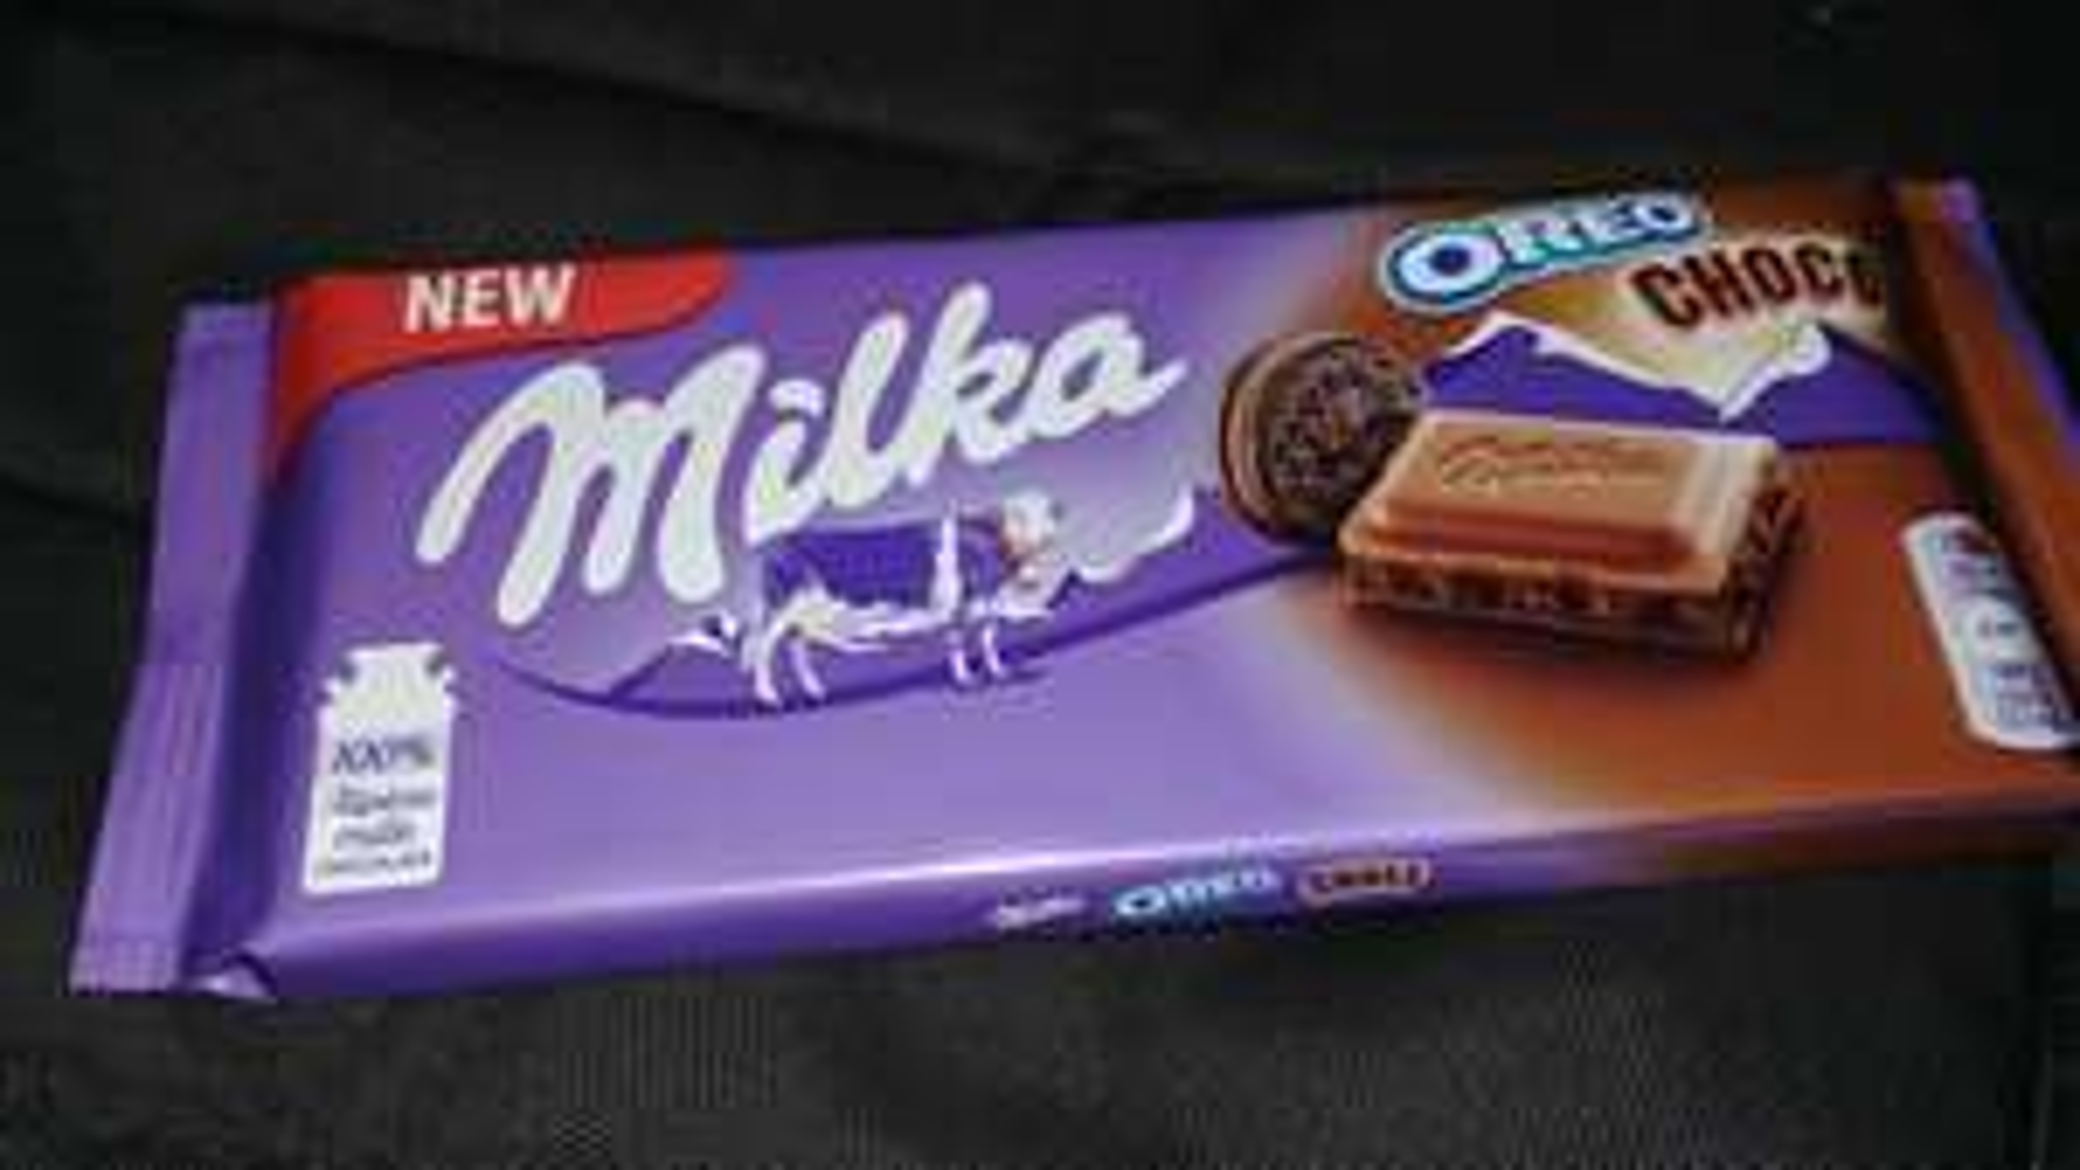 Cinema City gratis czekolada Milka oreo na wejsciu.